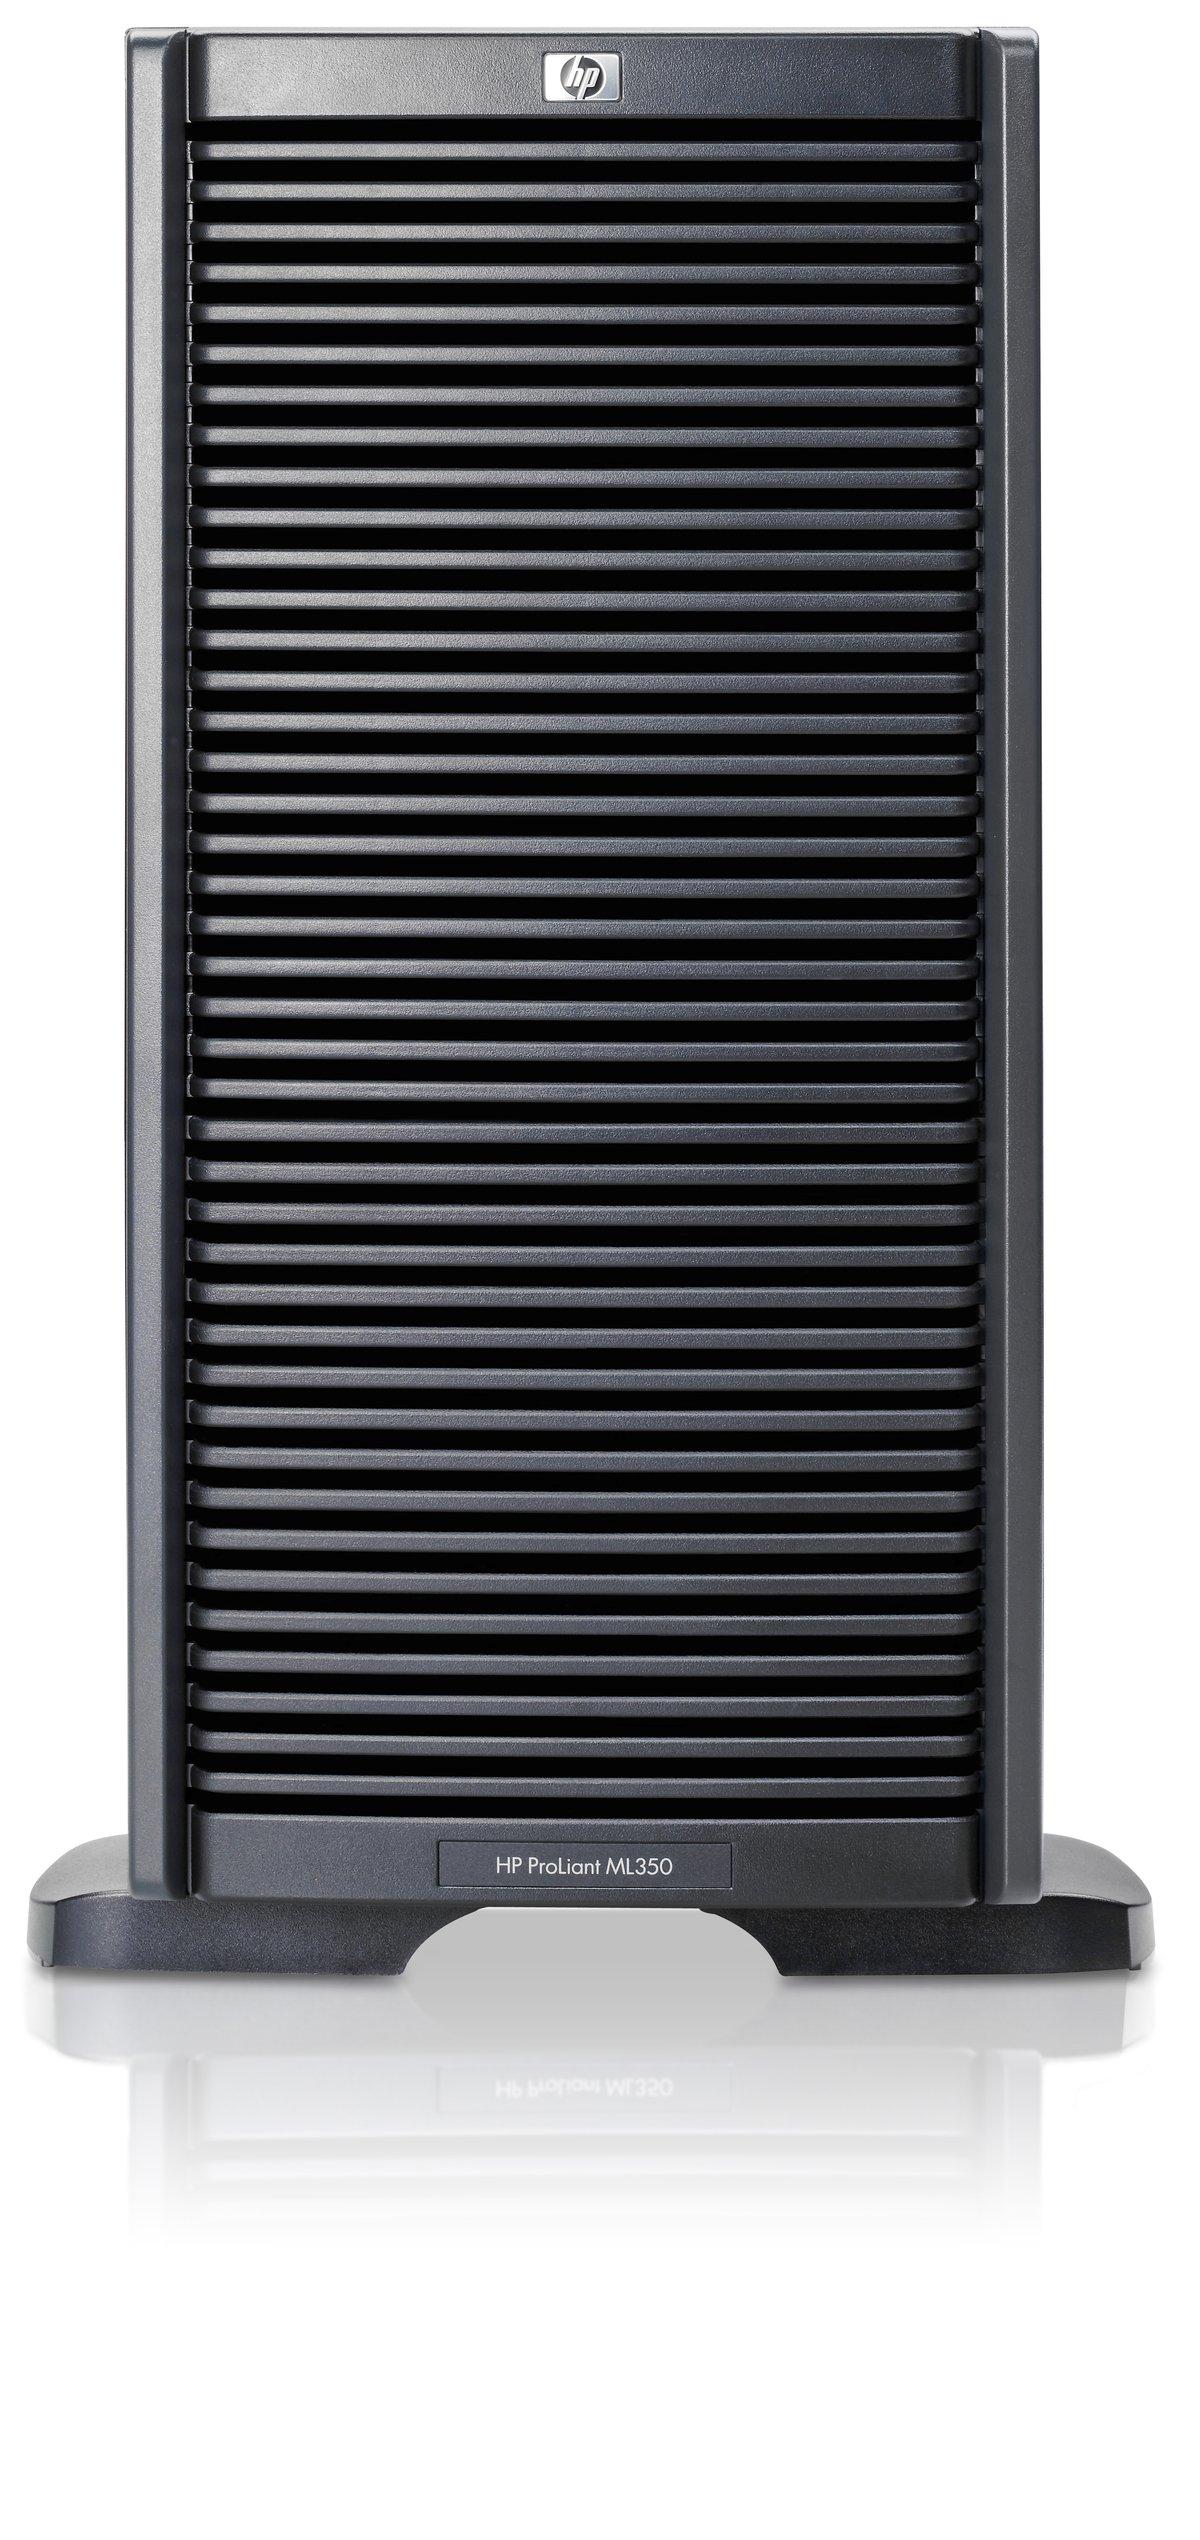 "HP Proliant ML350 G6 Rack SFF Server 8-Core 2.40GHz E5620 24GB No 2.5/"" HDD"